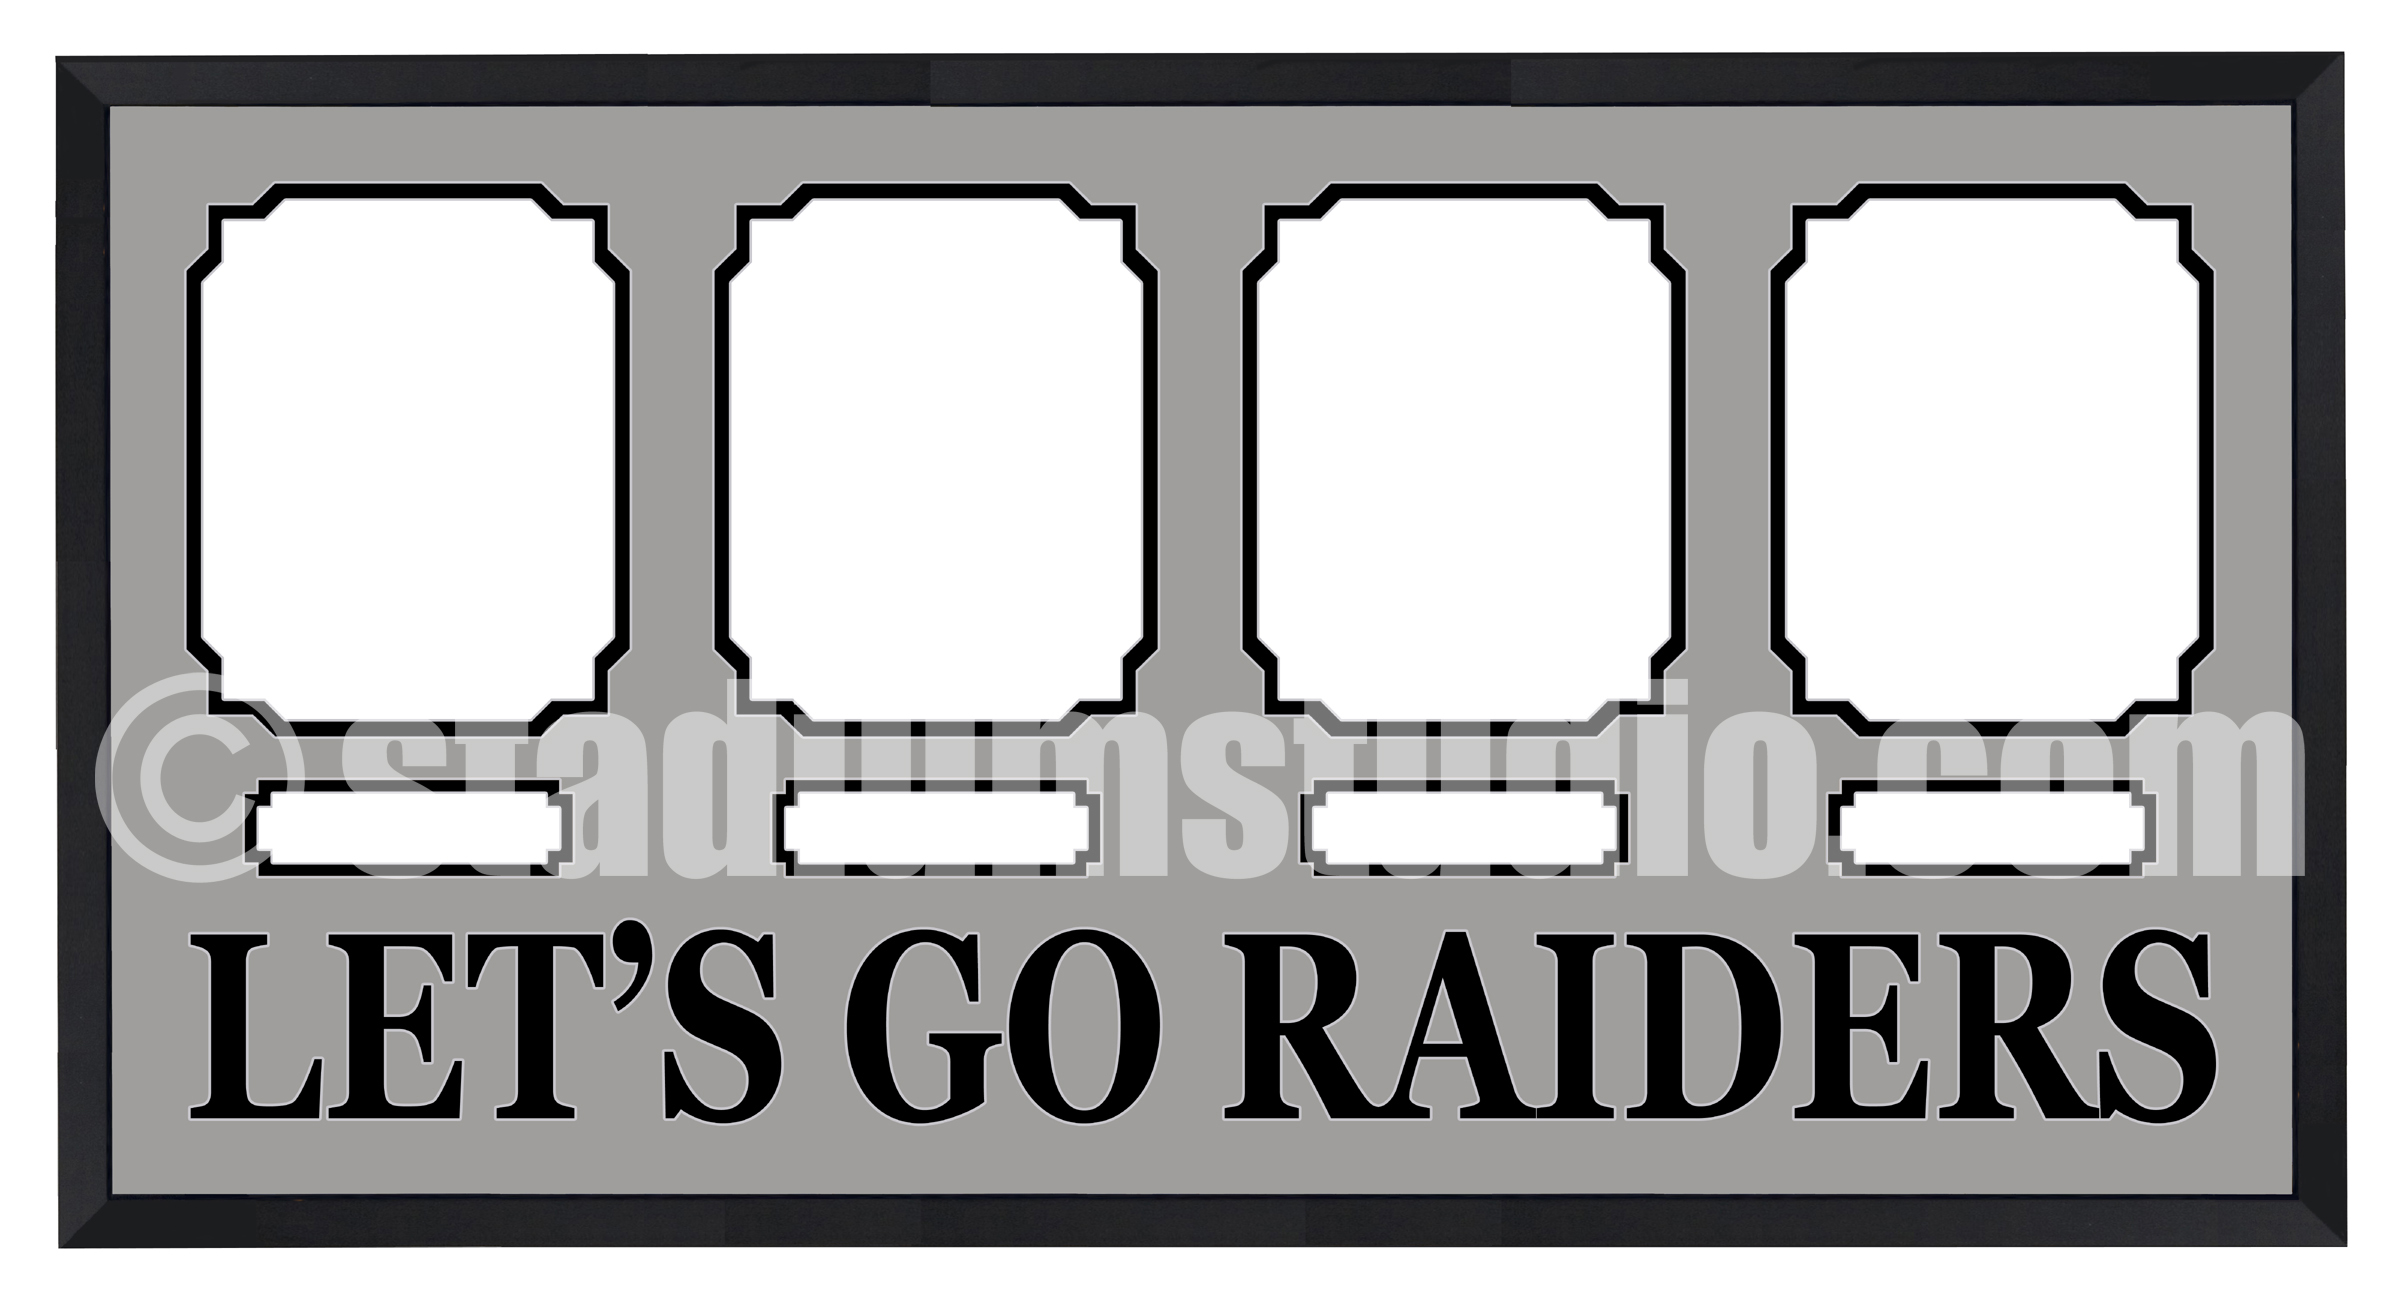 Oakland Raiders Customized Four Photo Team Frame - The Stadium Studio